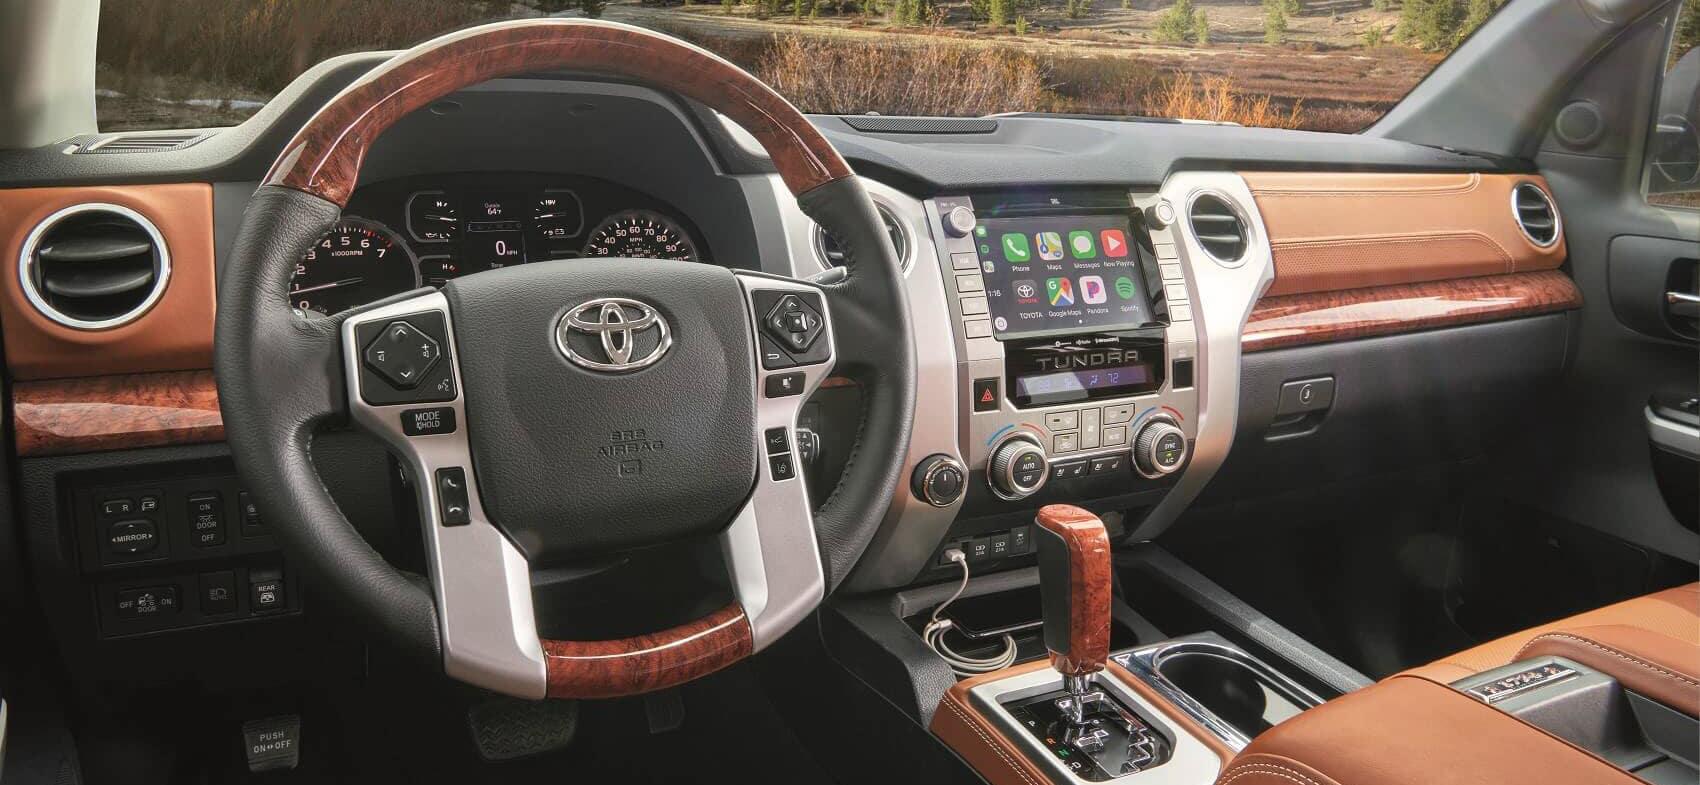 2020 Toyota Tundra Interior Apple CarPlay® Technology